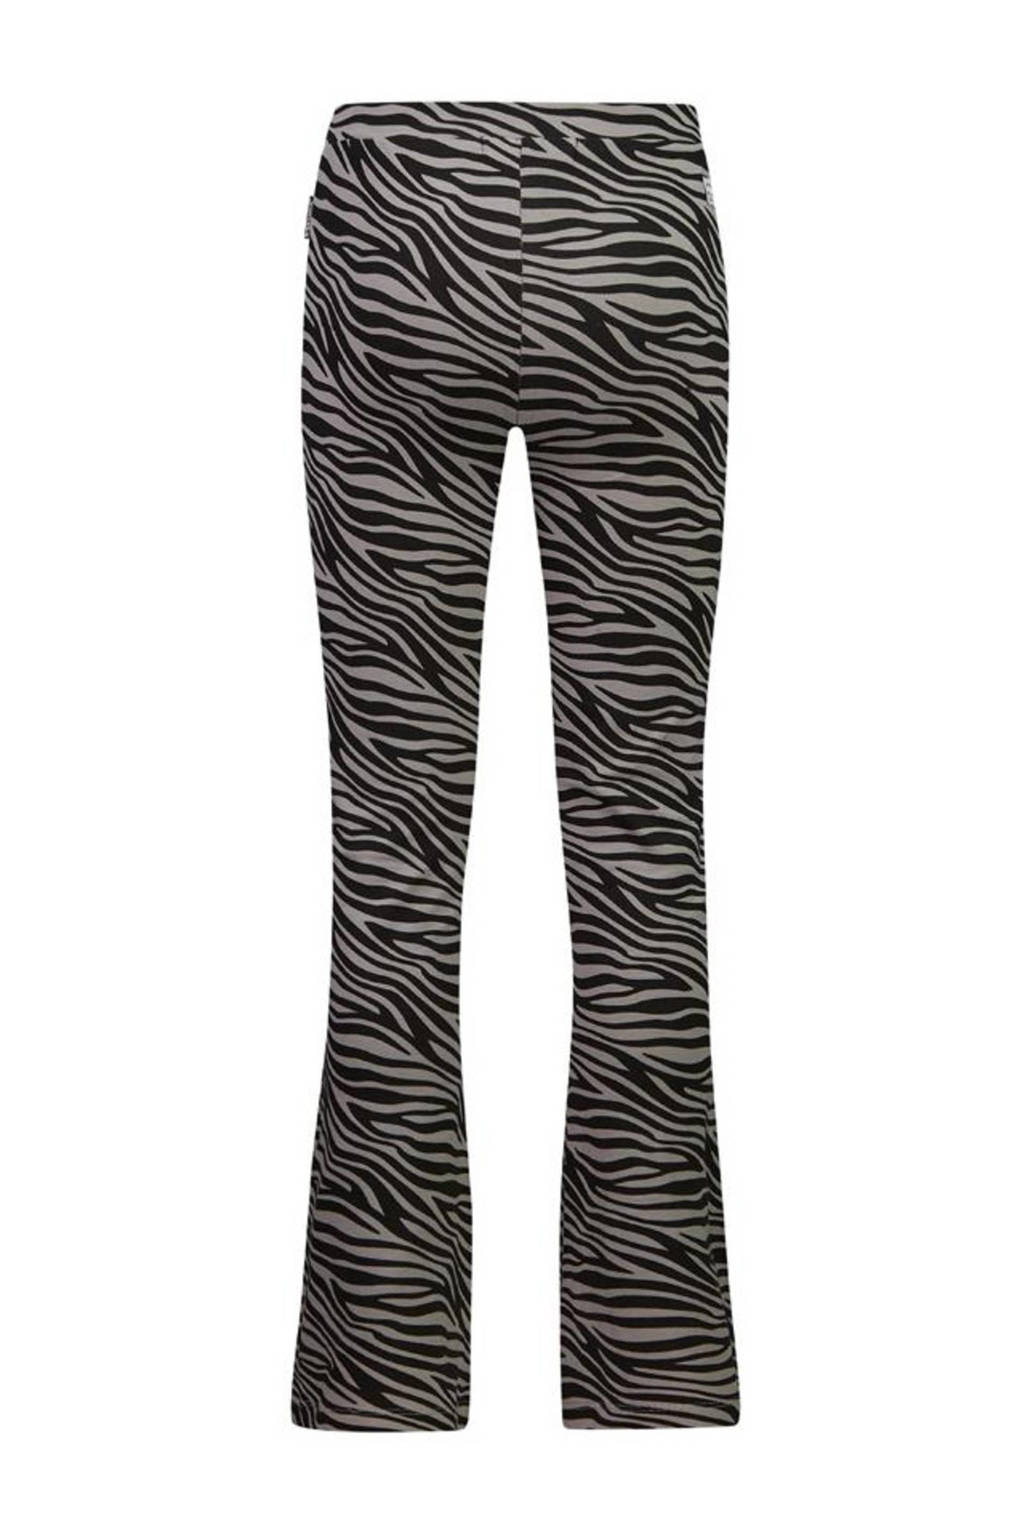 Retour Denim flared broek Bouskoura met zebraprint zwart, Zwart